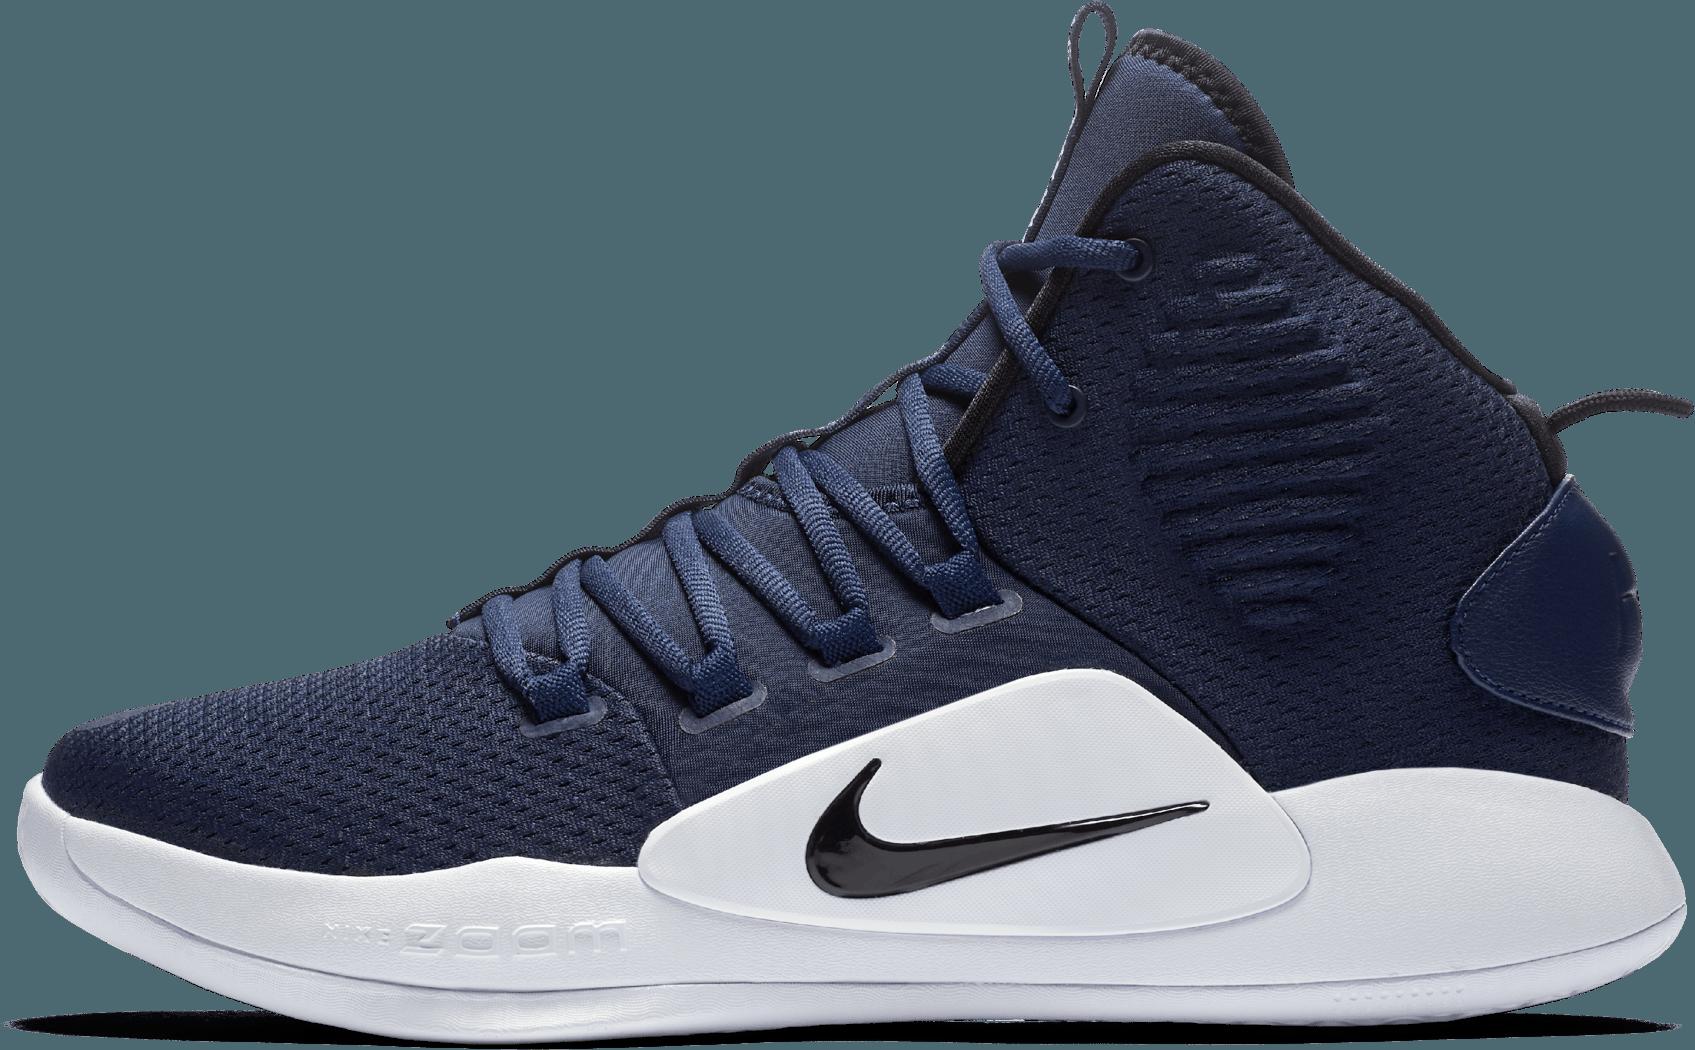 BUY OFF-WHITE X Nike React Hyperdunk 2017 | Kixify Marketplace | 1050x1695